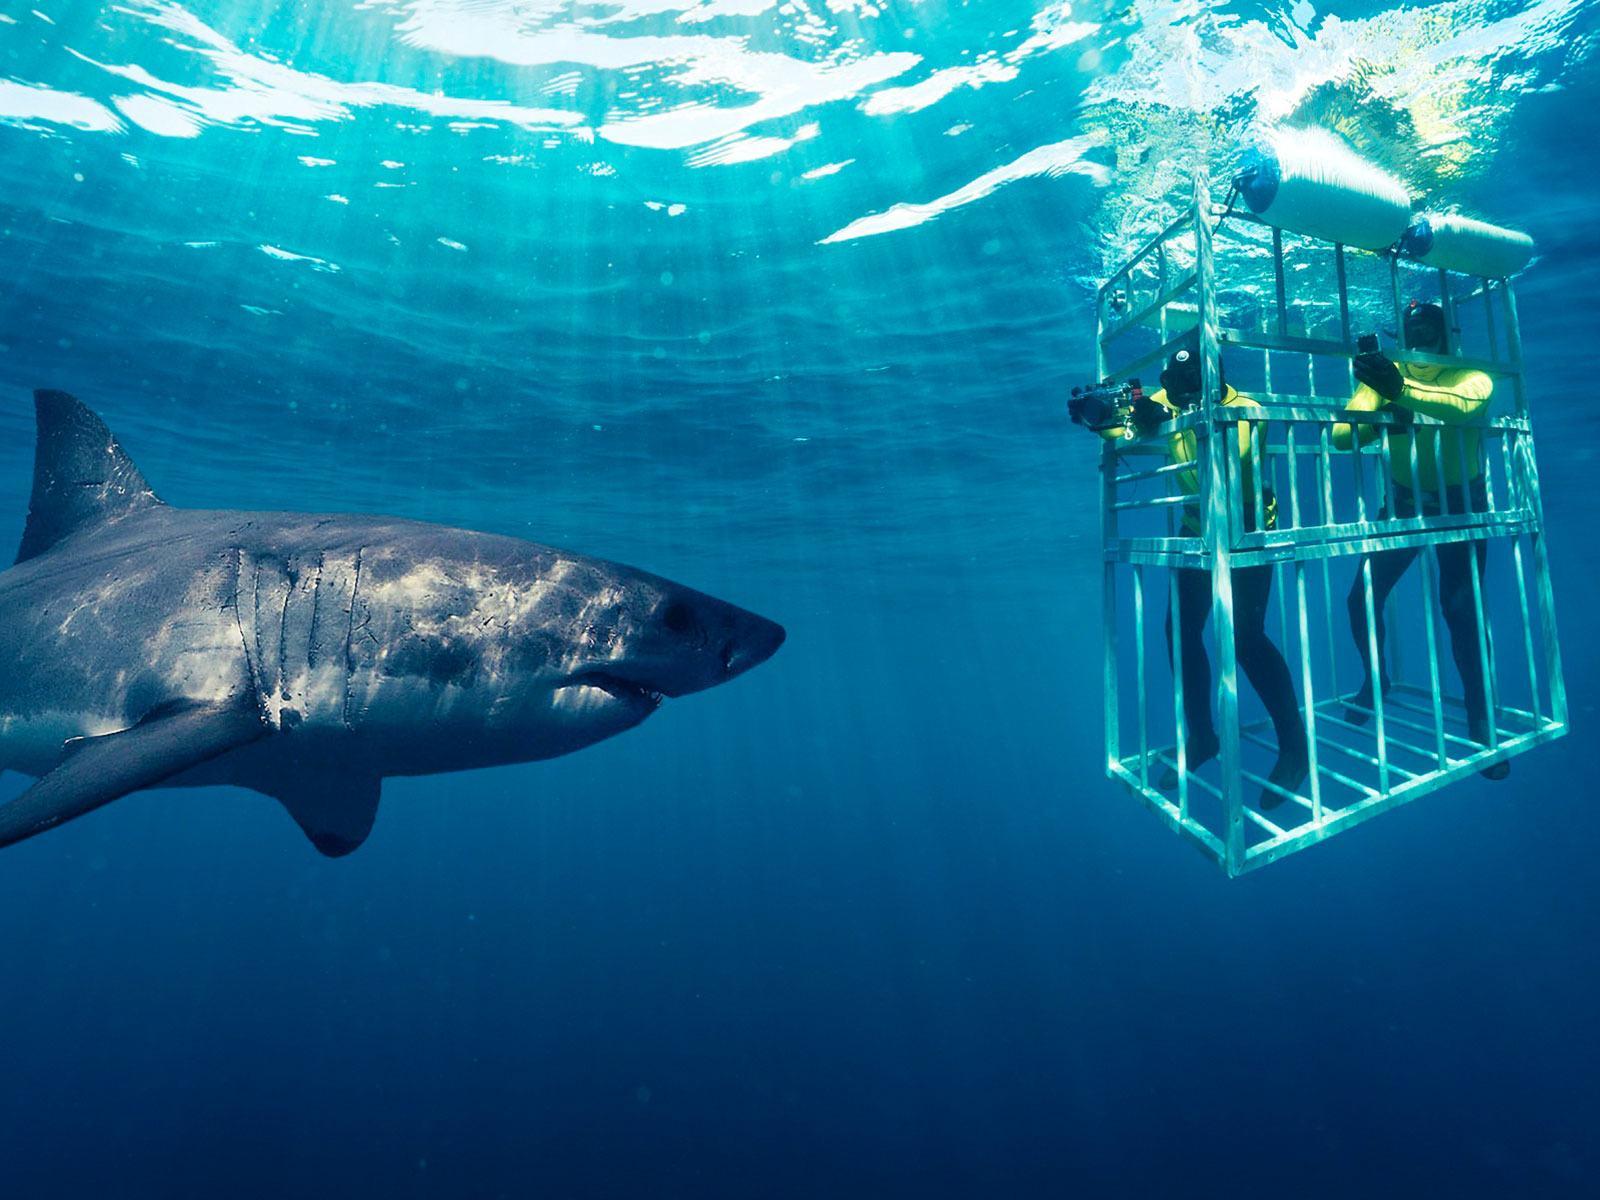 https://www.pureafricaexperiences.com/destinations/shark-cage-diving/